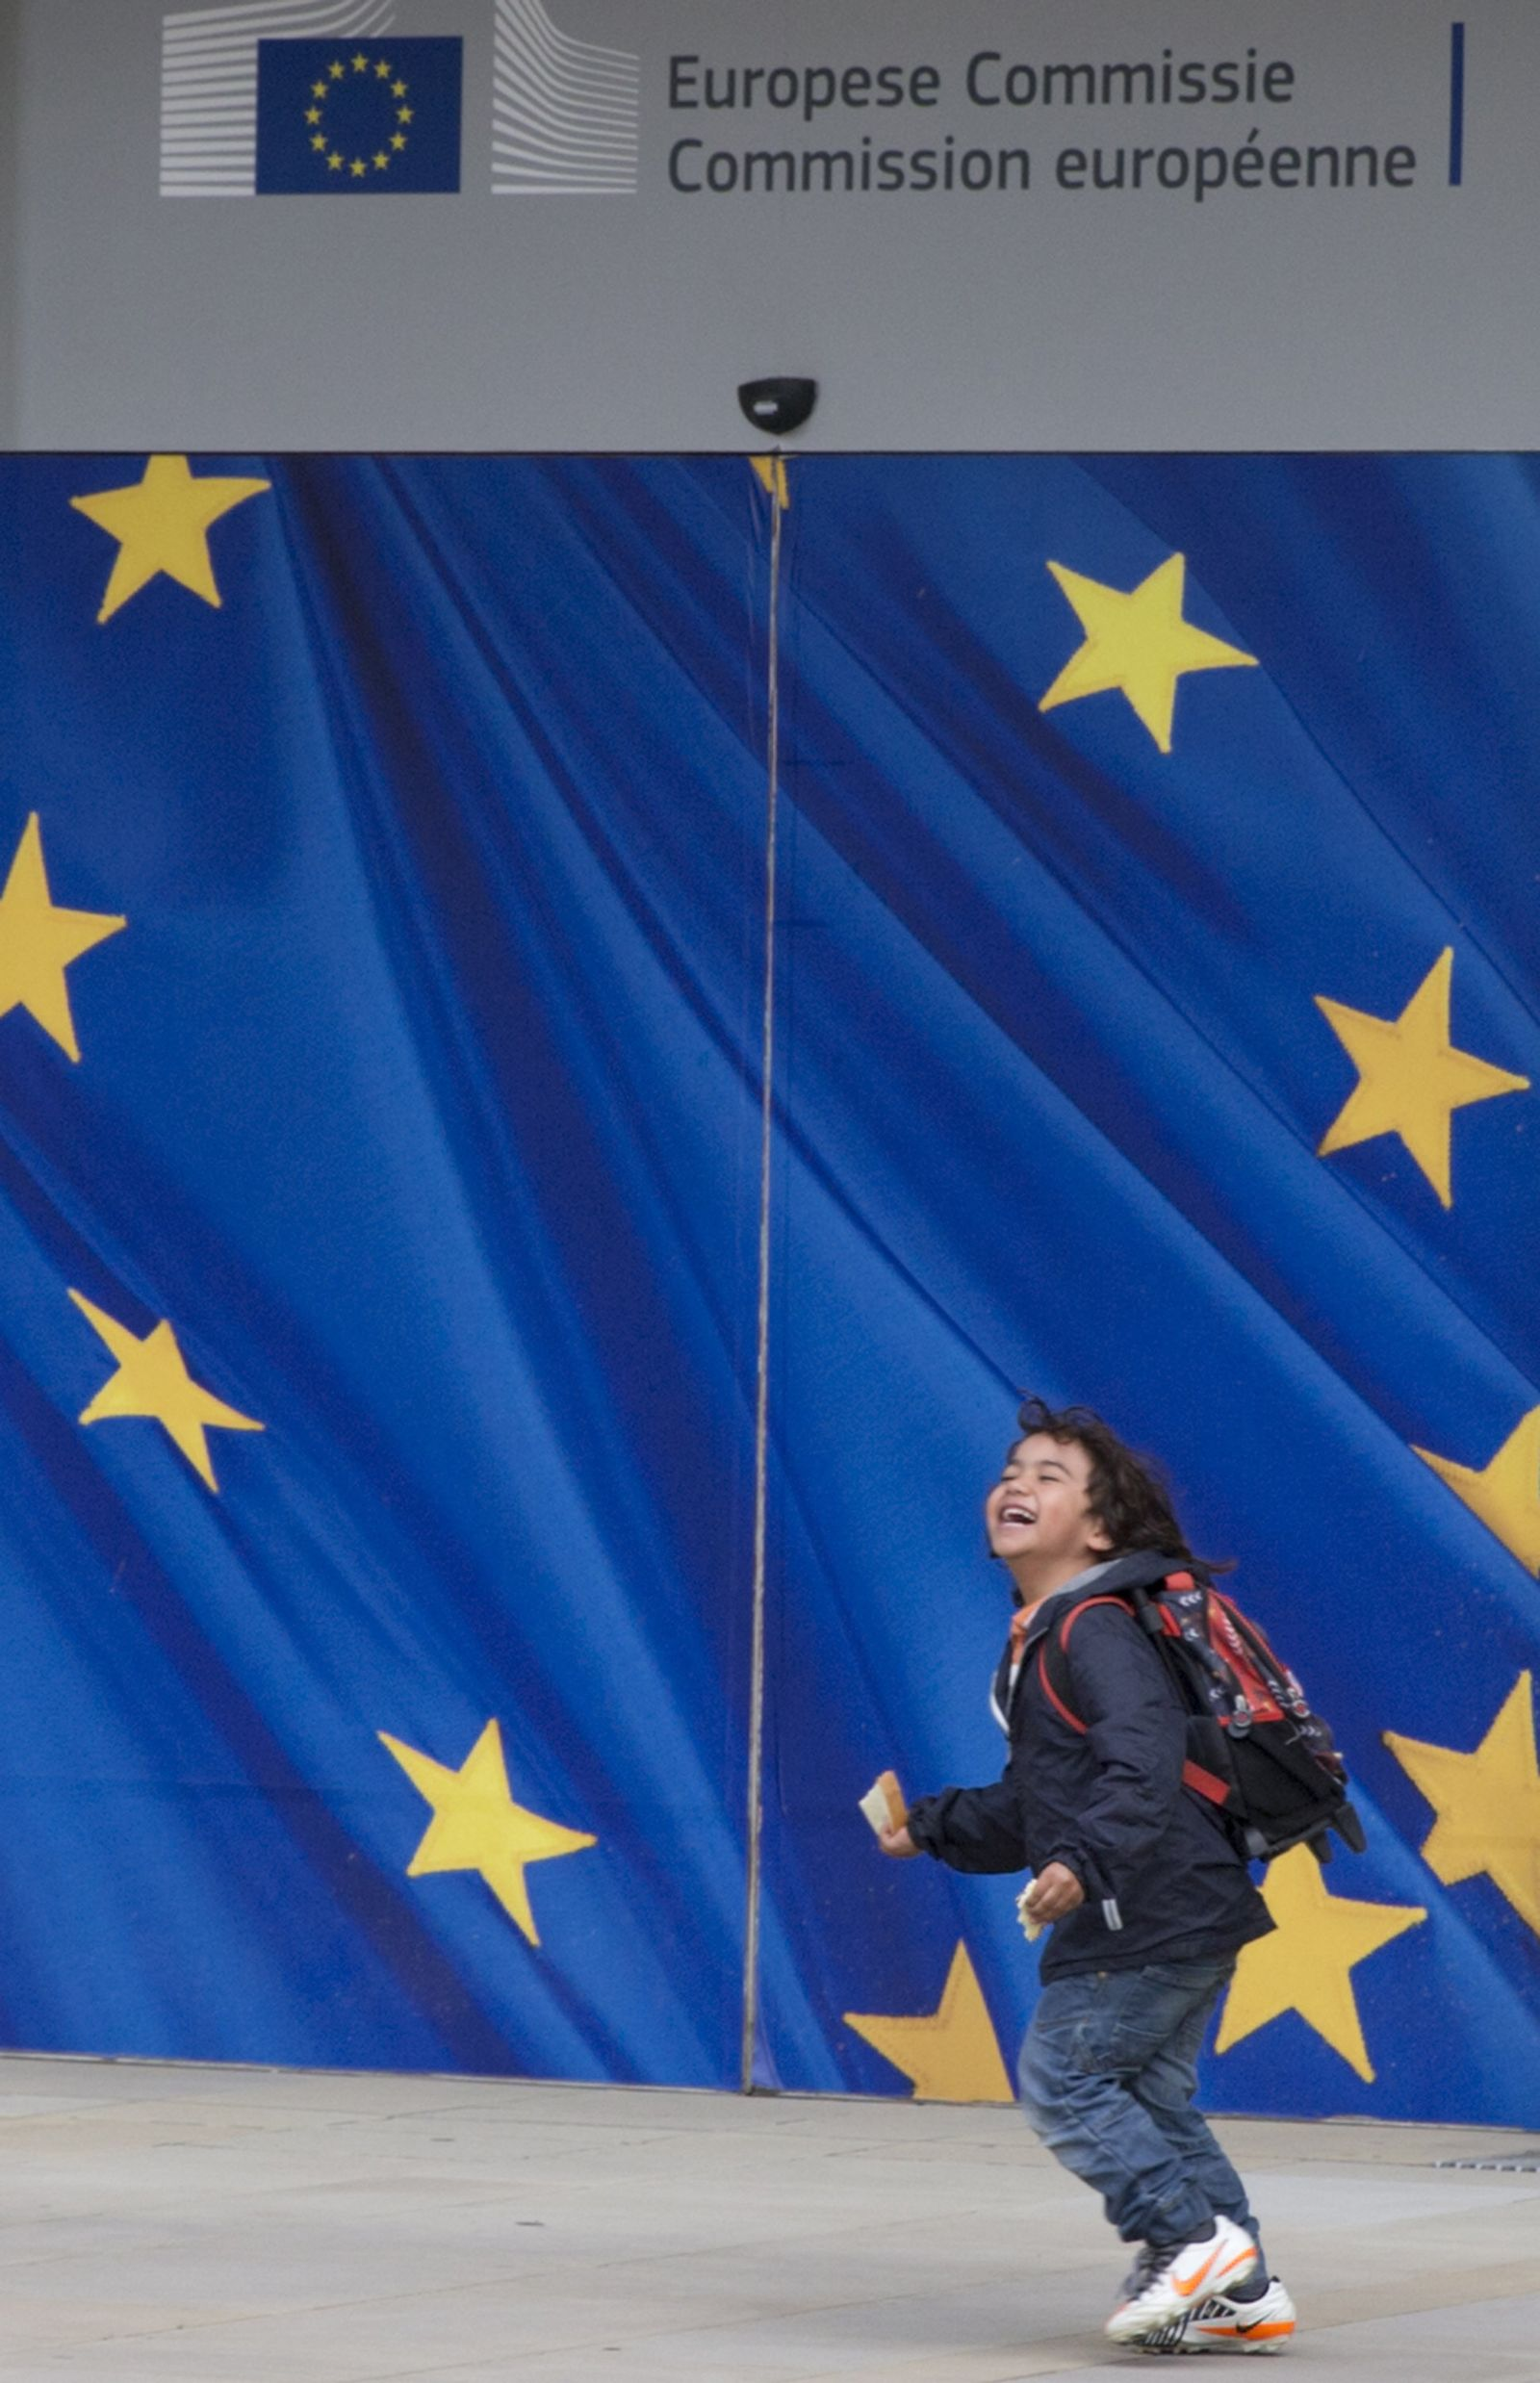 EU Europa Flagge Kind